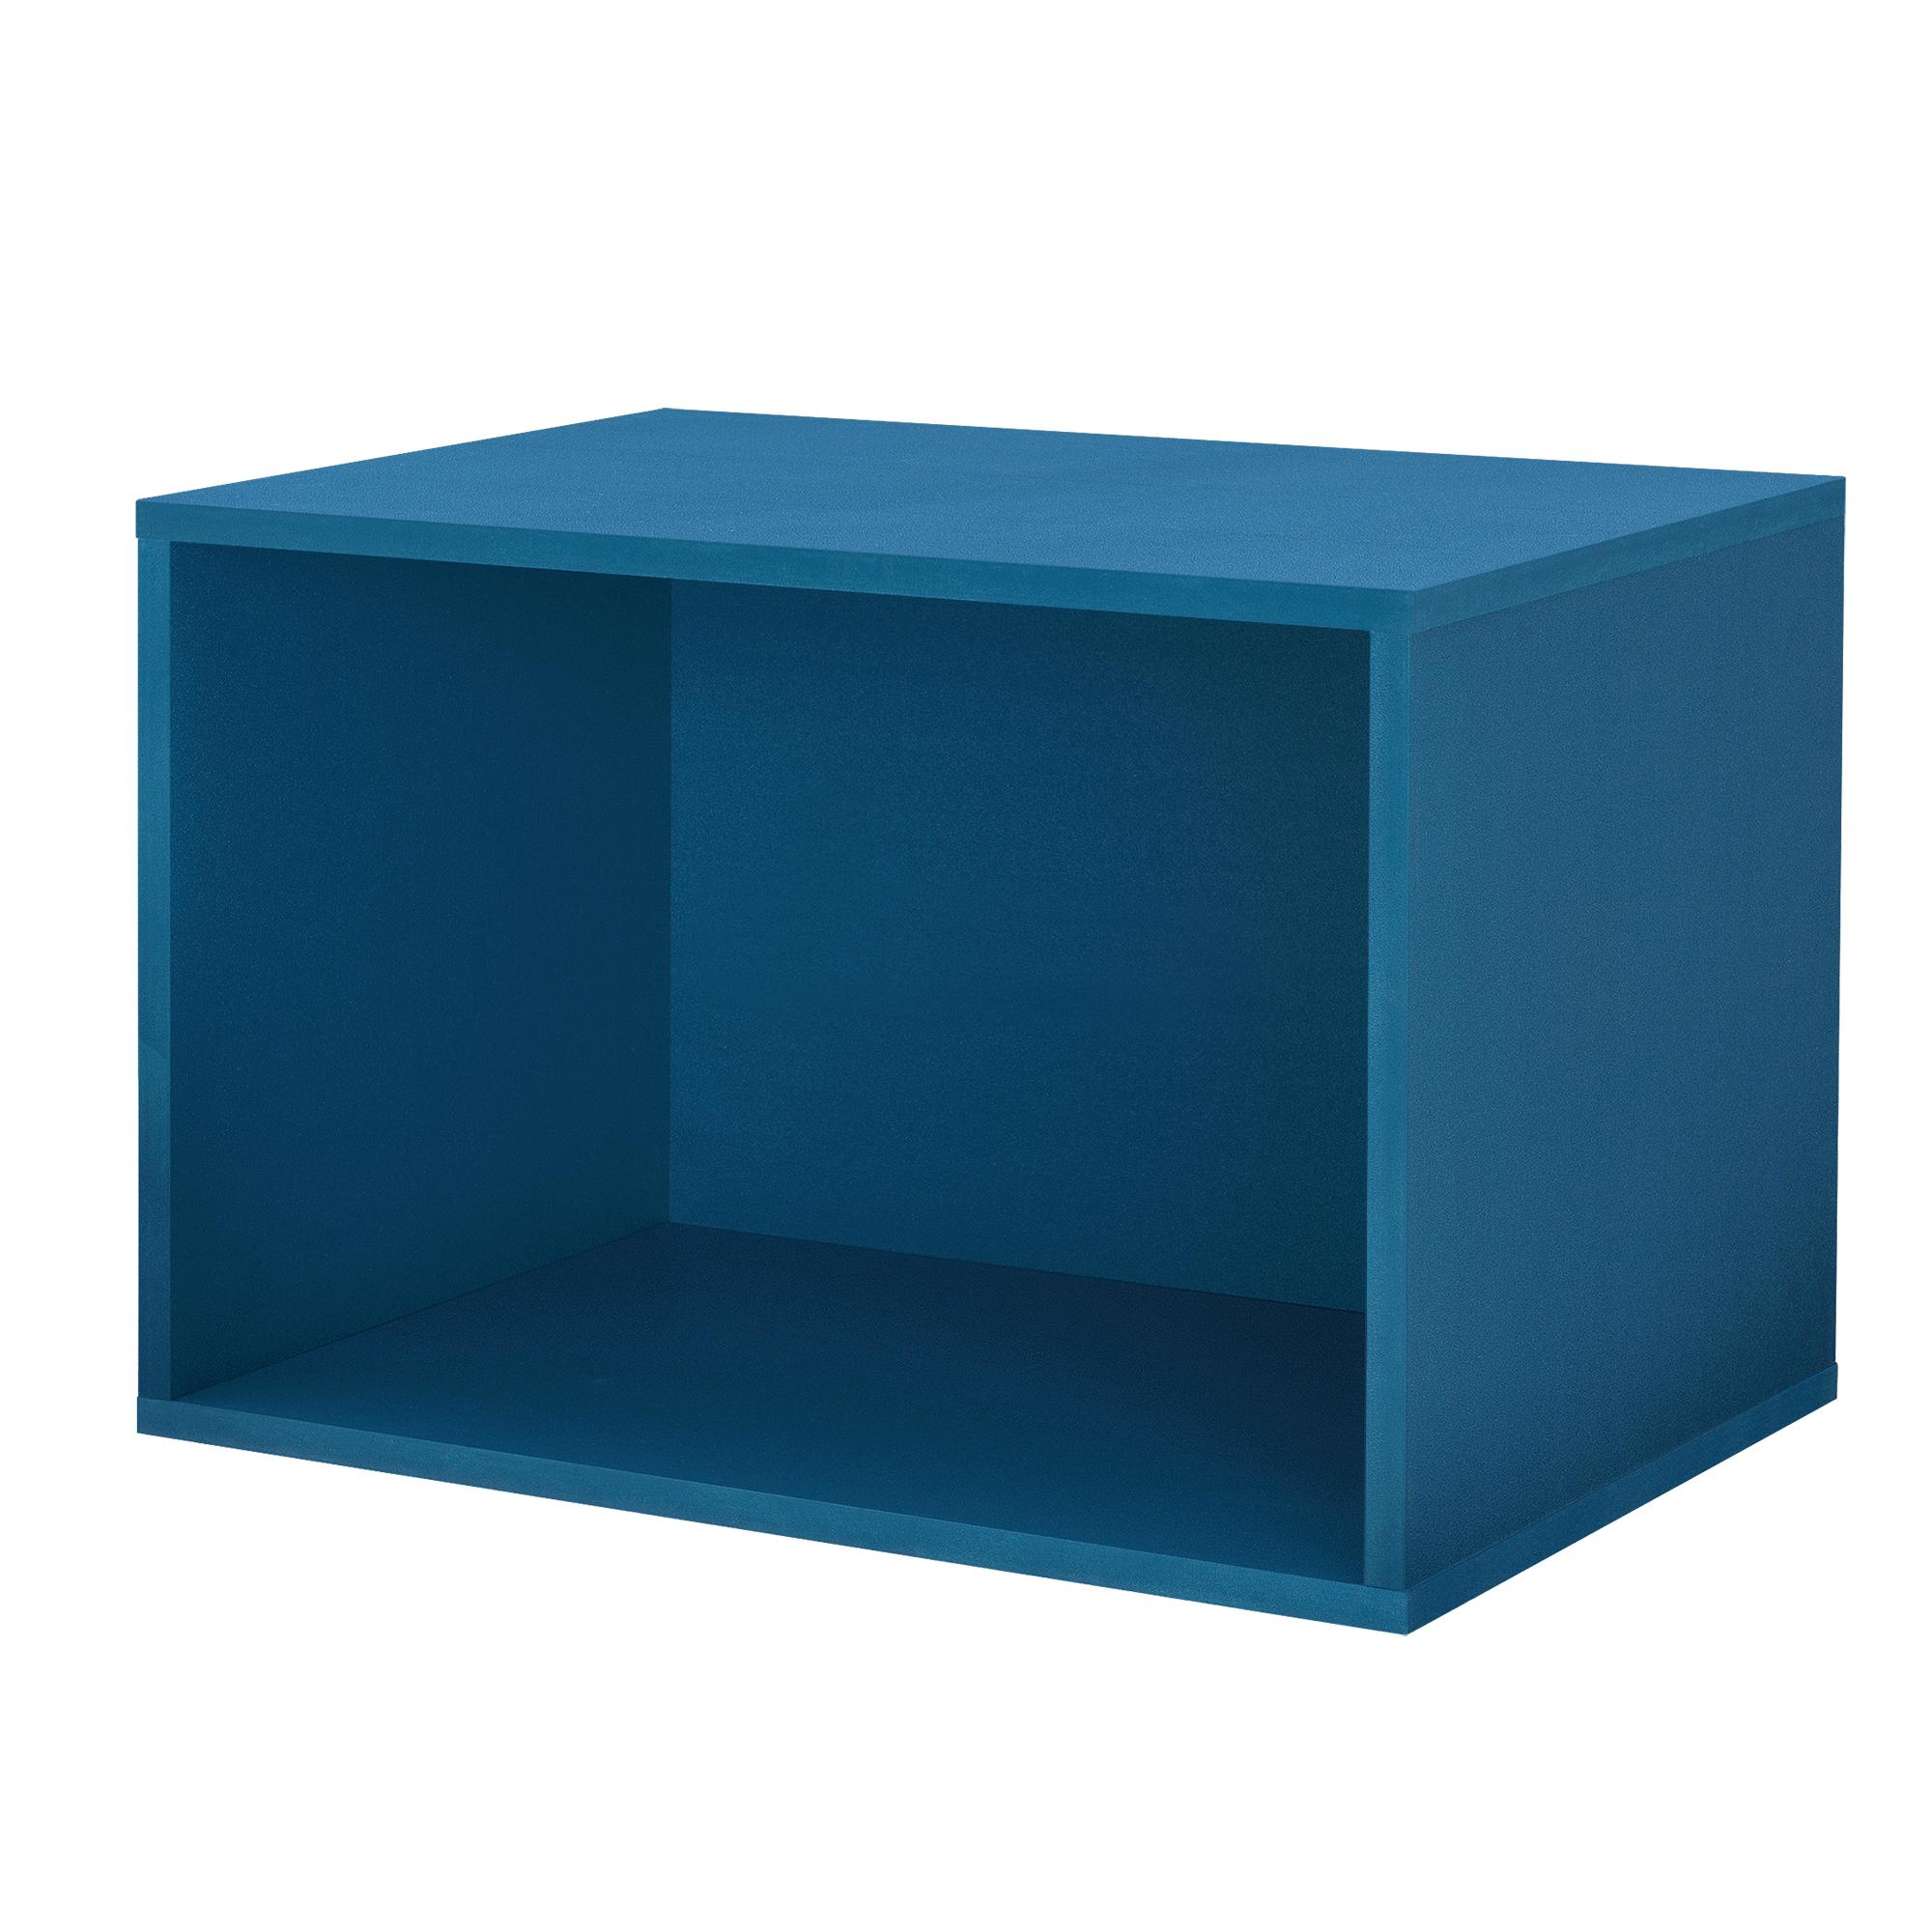 regal 45x30x30cm t rkis wandregal h ngeregal b cherregal kombinierbar ebay. Black Bedroom Furniture Sets. Home Design Ideas